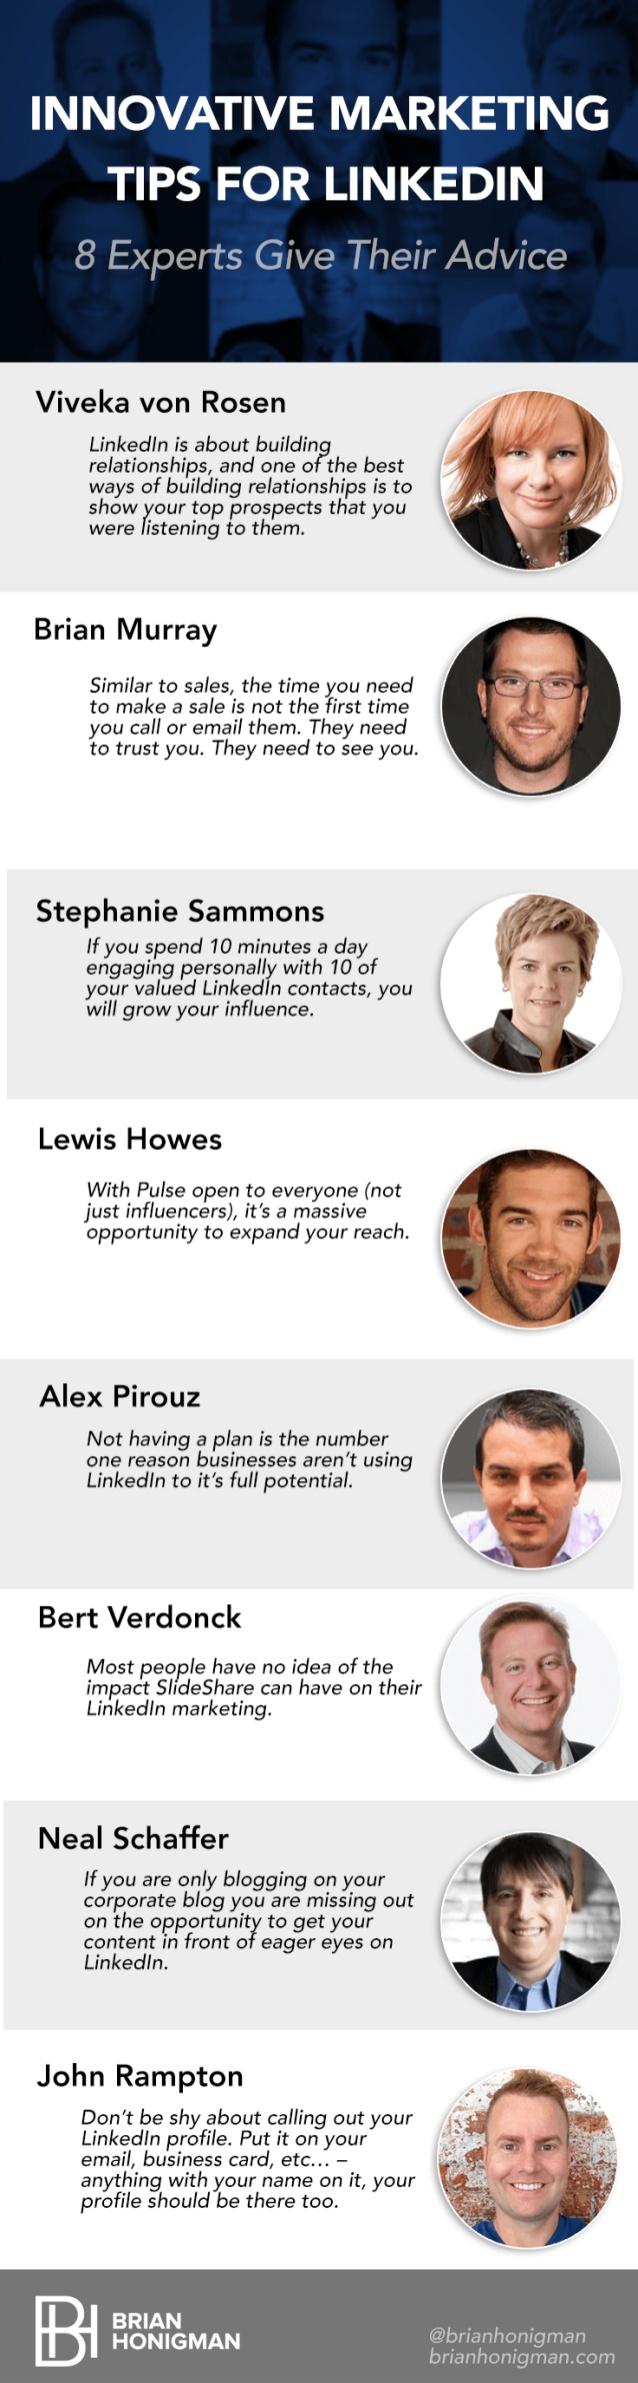 8 consejos sobre marketing en Linkedin